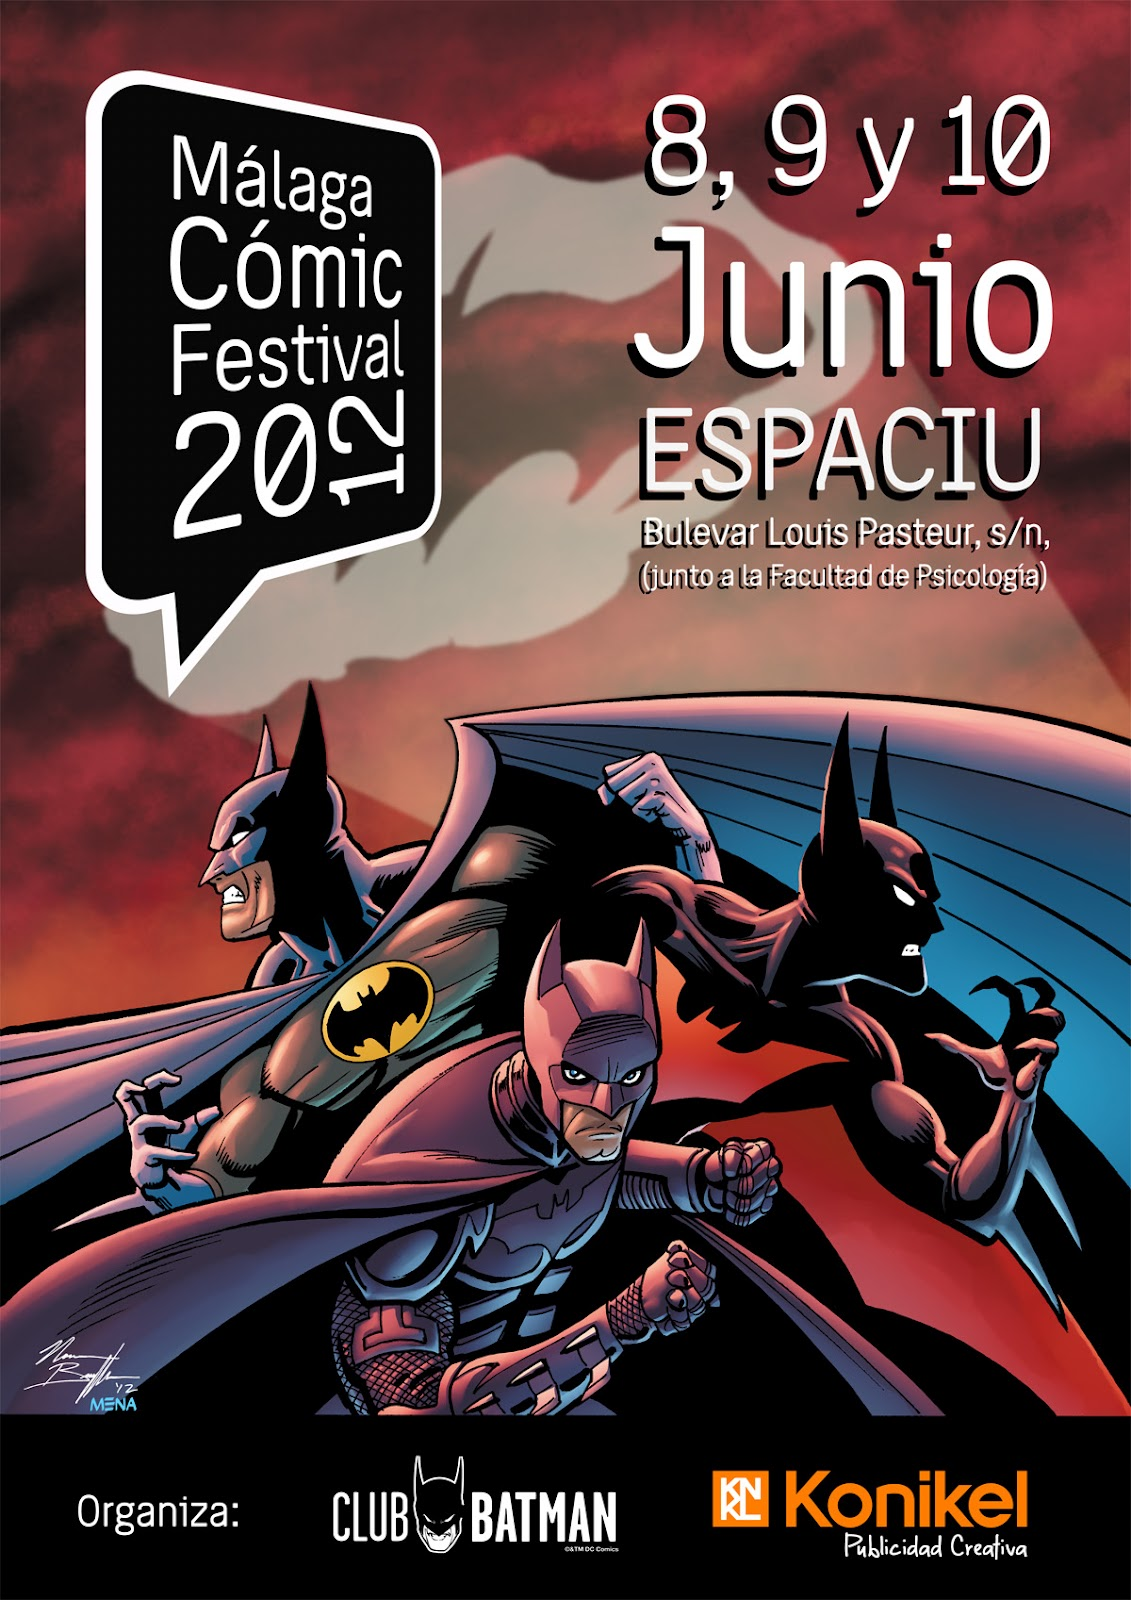 Málaga Comic Festival 2012 MCFPosterINTERNETlr